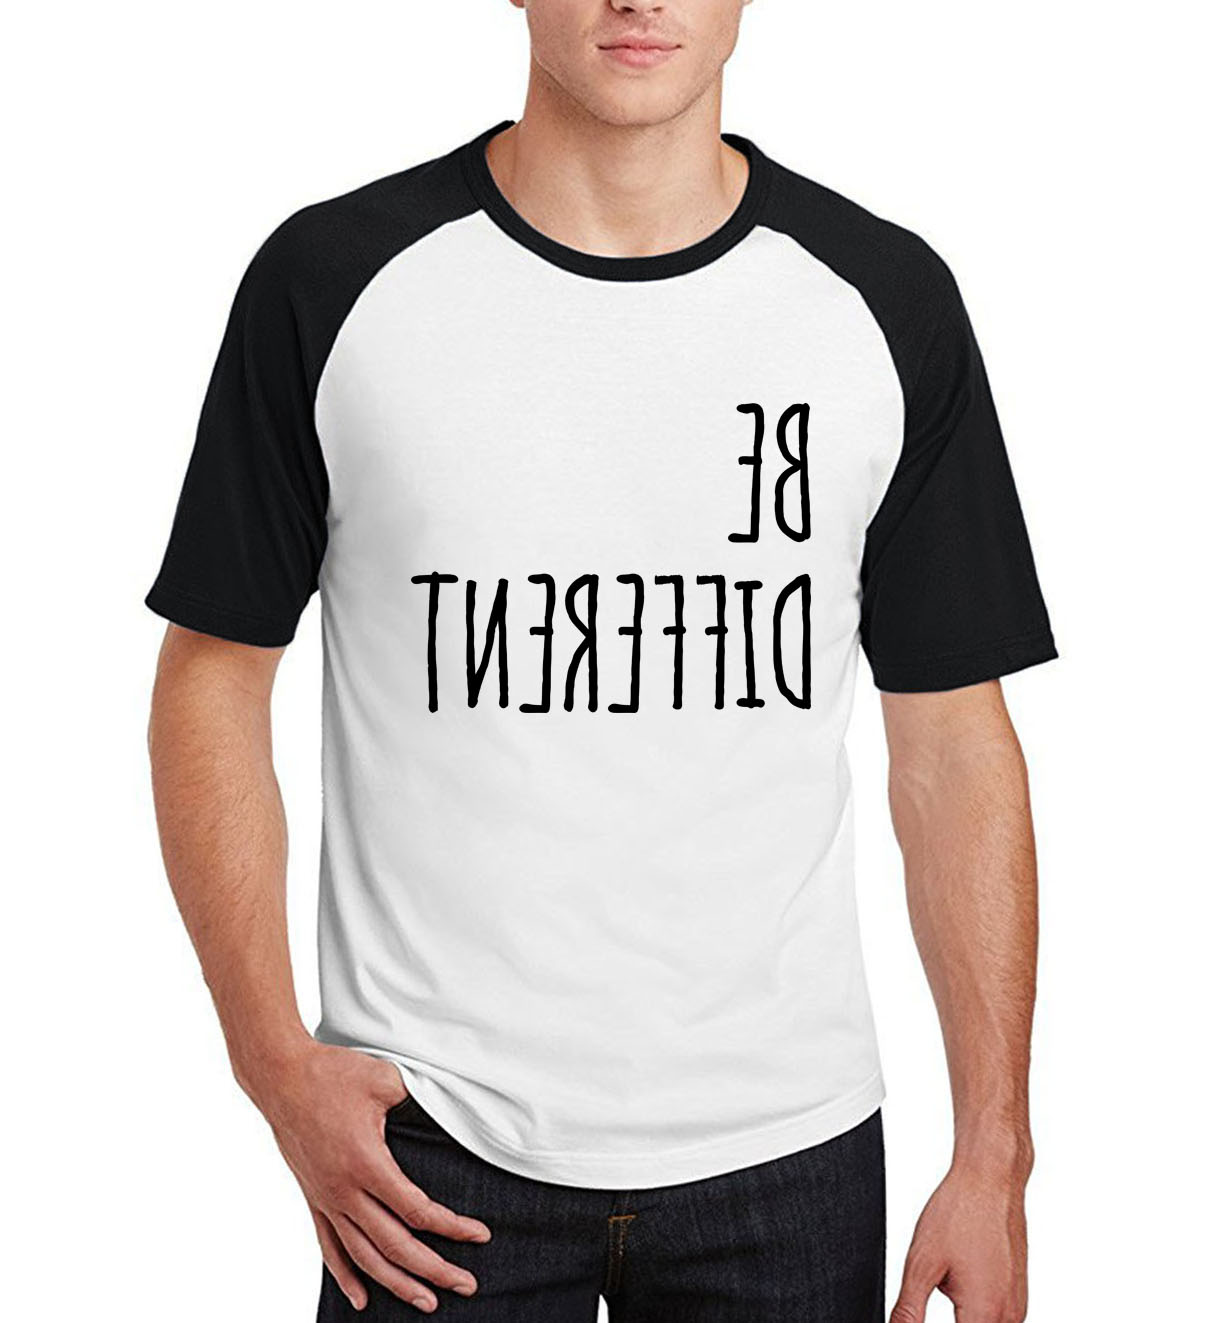 male harajuku short sleeve tops Hipster man's Look Men  T-Shirt 2019 new arrival cotton o-neck raglan camisetas